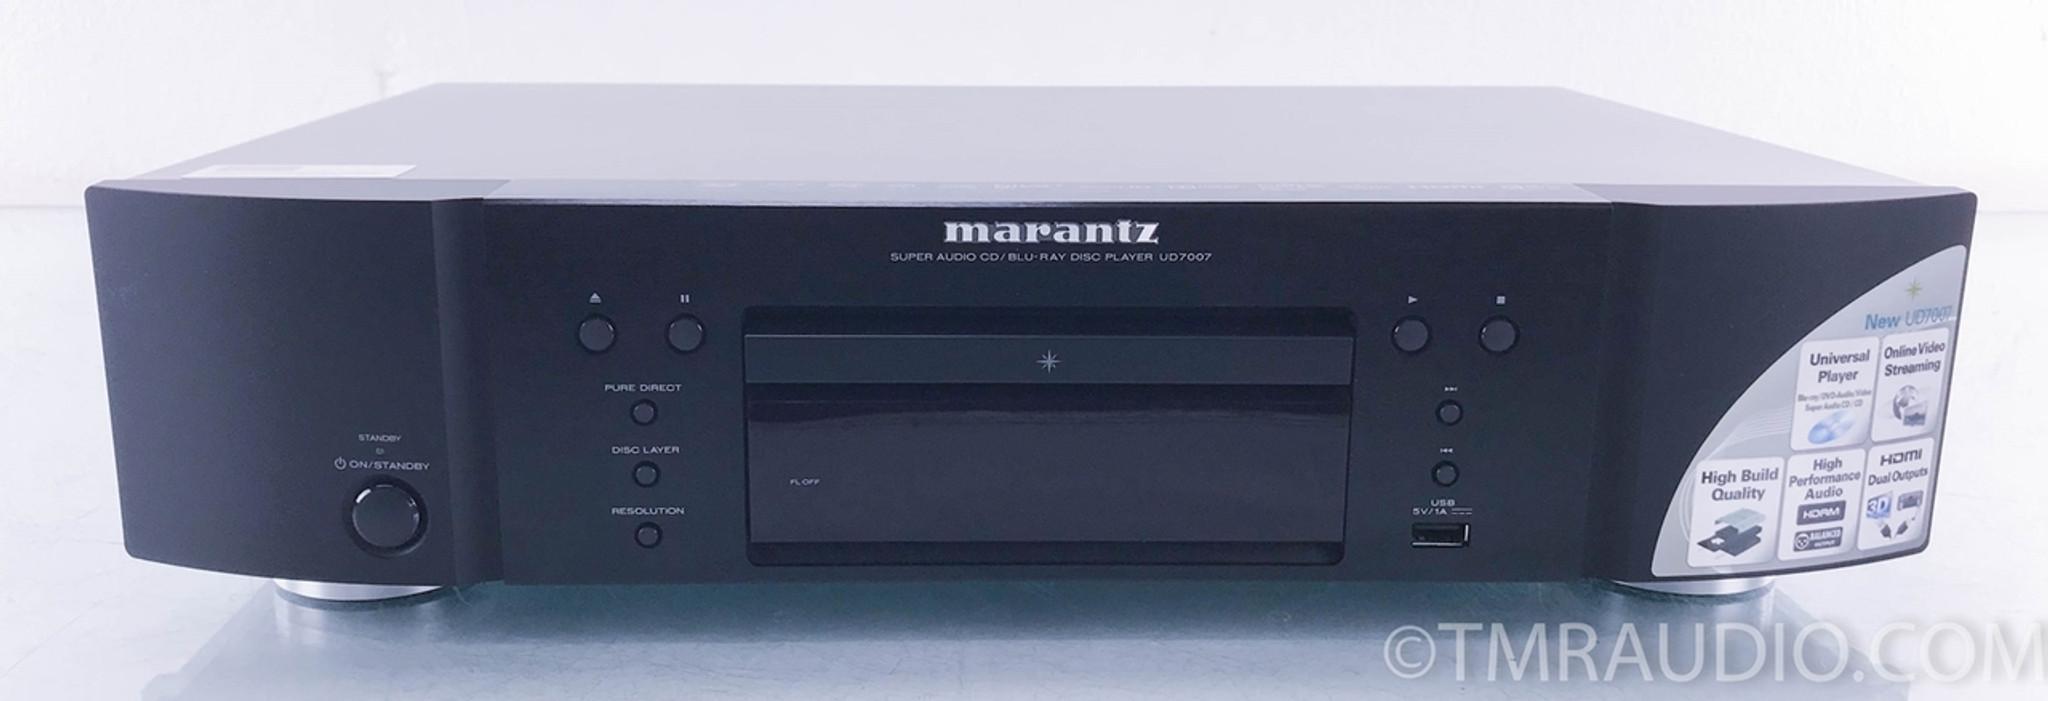 Marantz UD7007 Universal Player